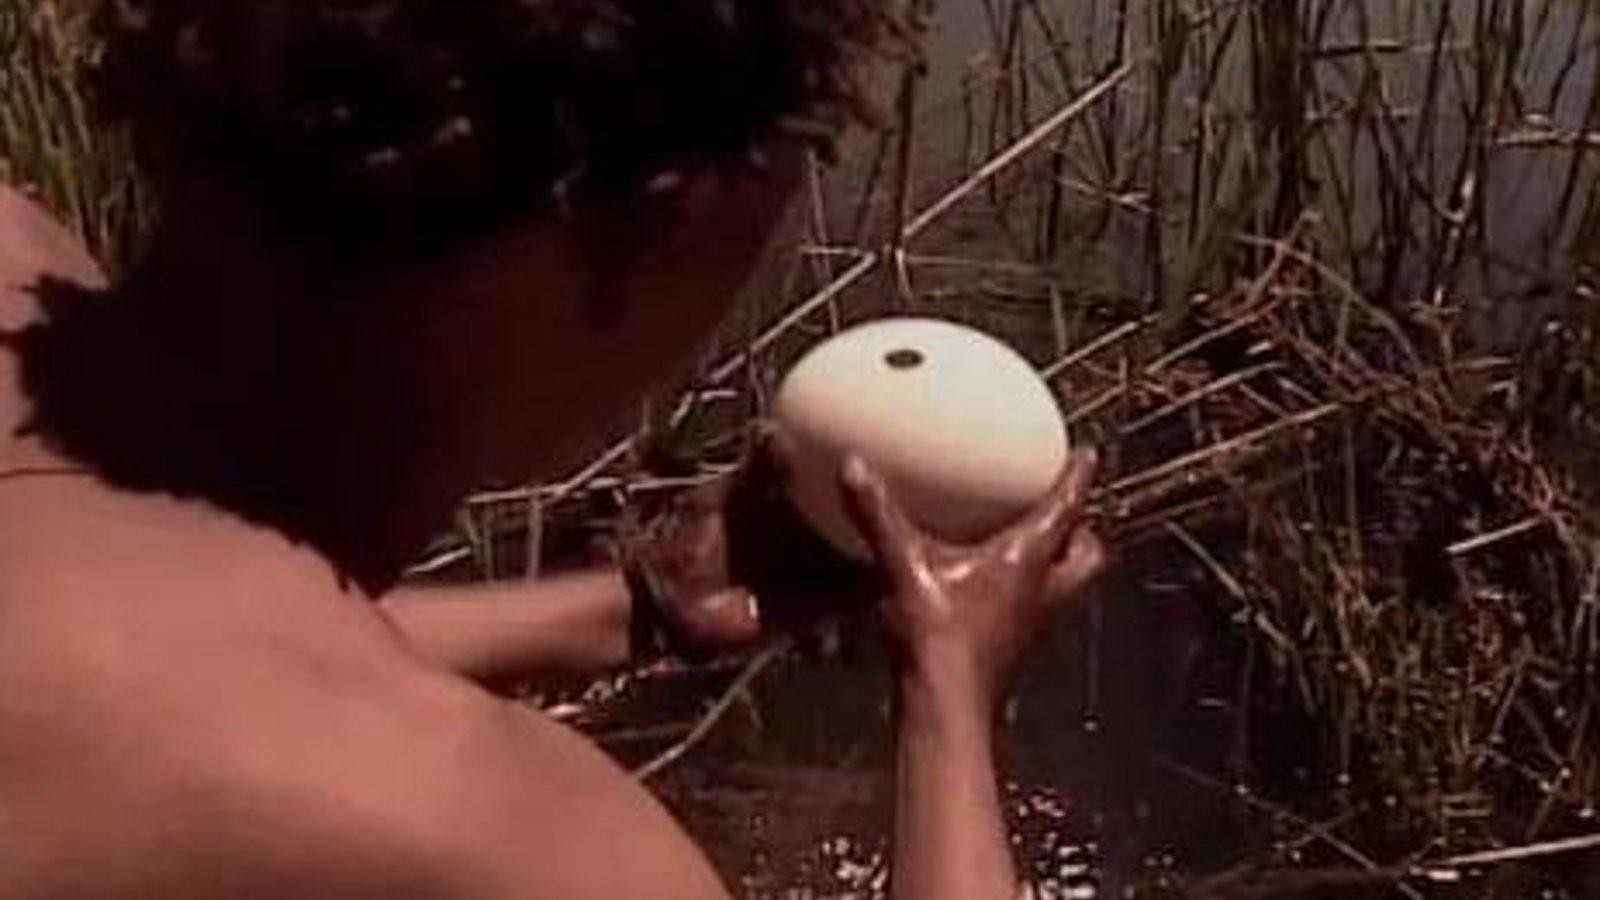 South Africa 6: Kagga Kamma - Land of the Bushmen